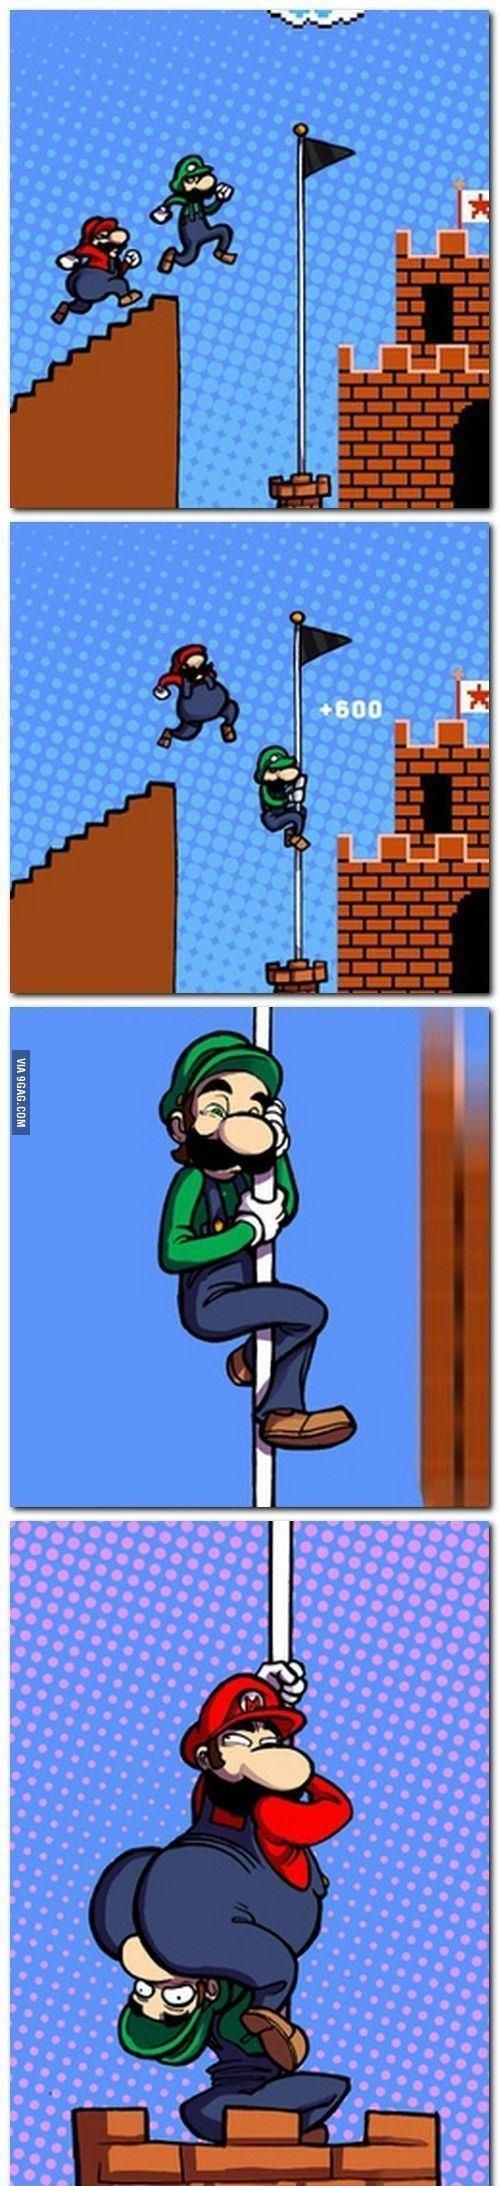 Scroll2Lol.com - Mario isnt good at pole dancing